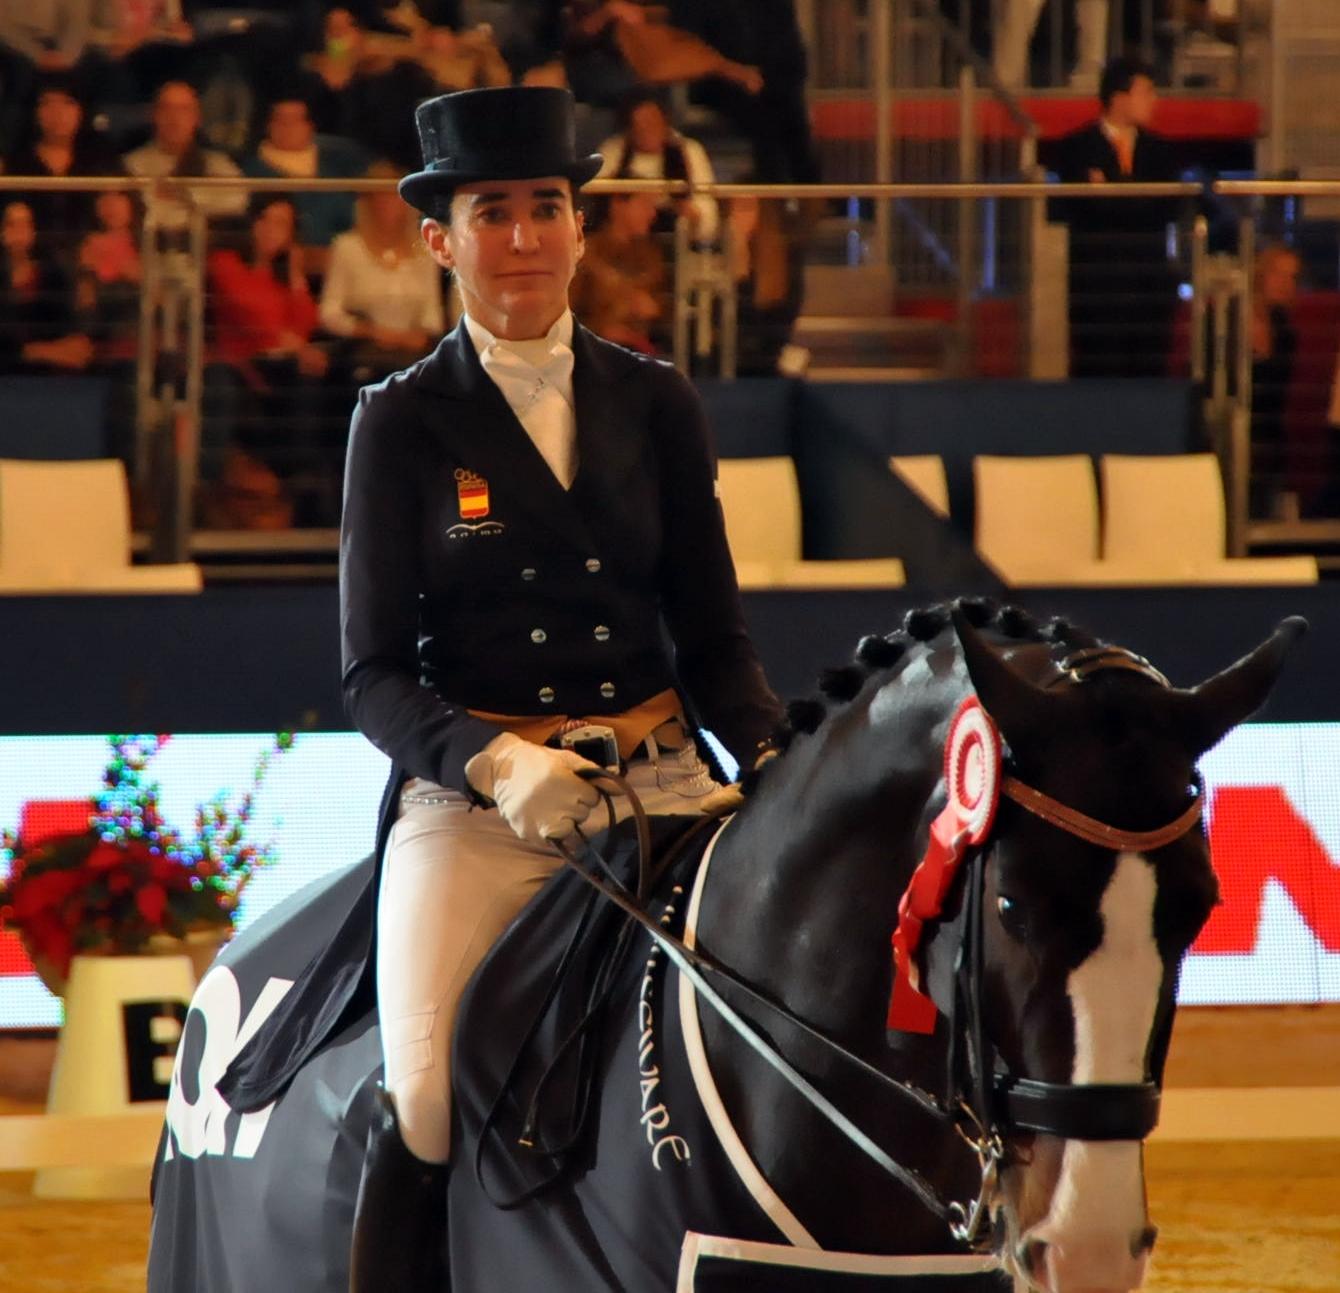 Beatriz Ferrer Salat ganadora de la Kur MH 2014